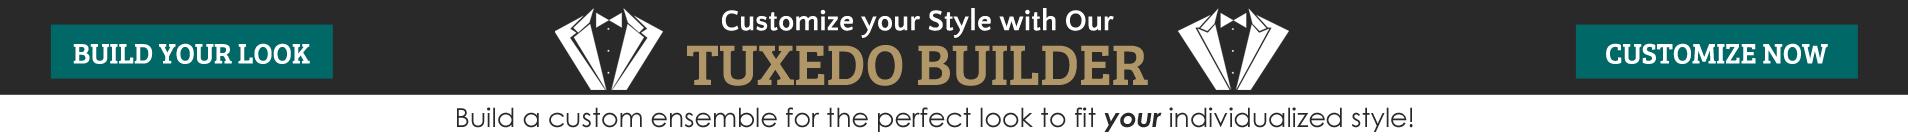 Tuxedo Builder Online Tuxedo Rental